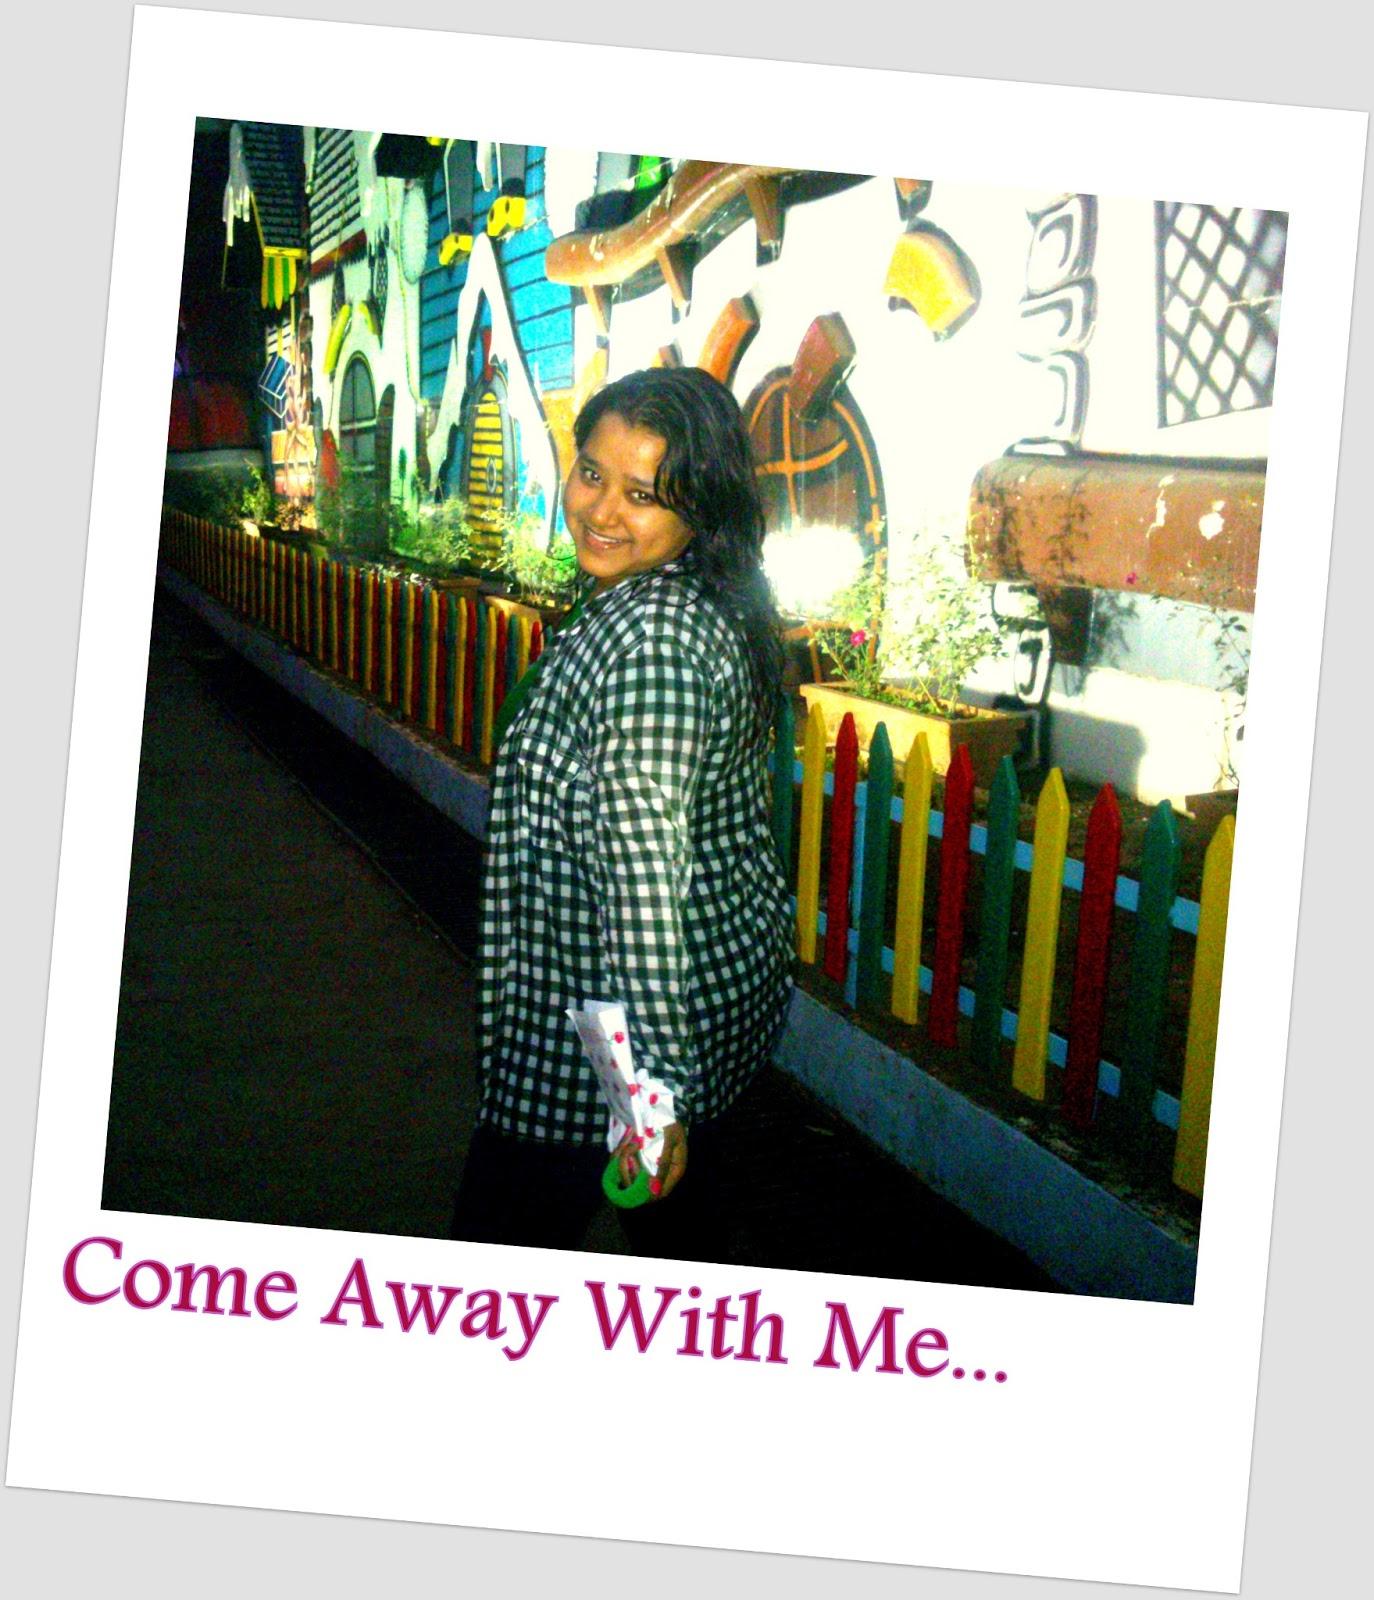 http://3.bp.blogspot.com/-wPOf13W969A/UWBs_WjZcZI/AAAAAAAAClU/4vjqJTWsPJY/s1600/polaroid1.jpg